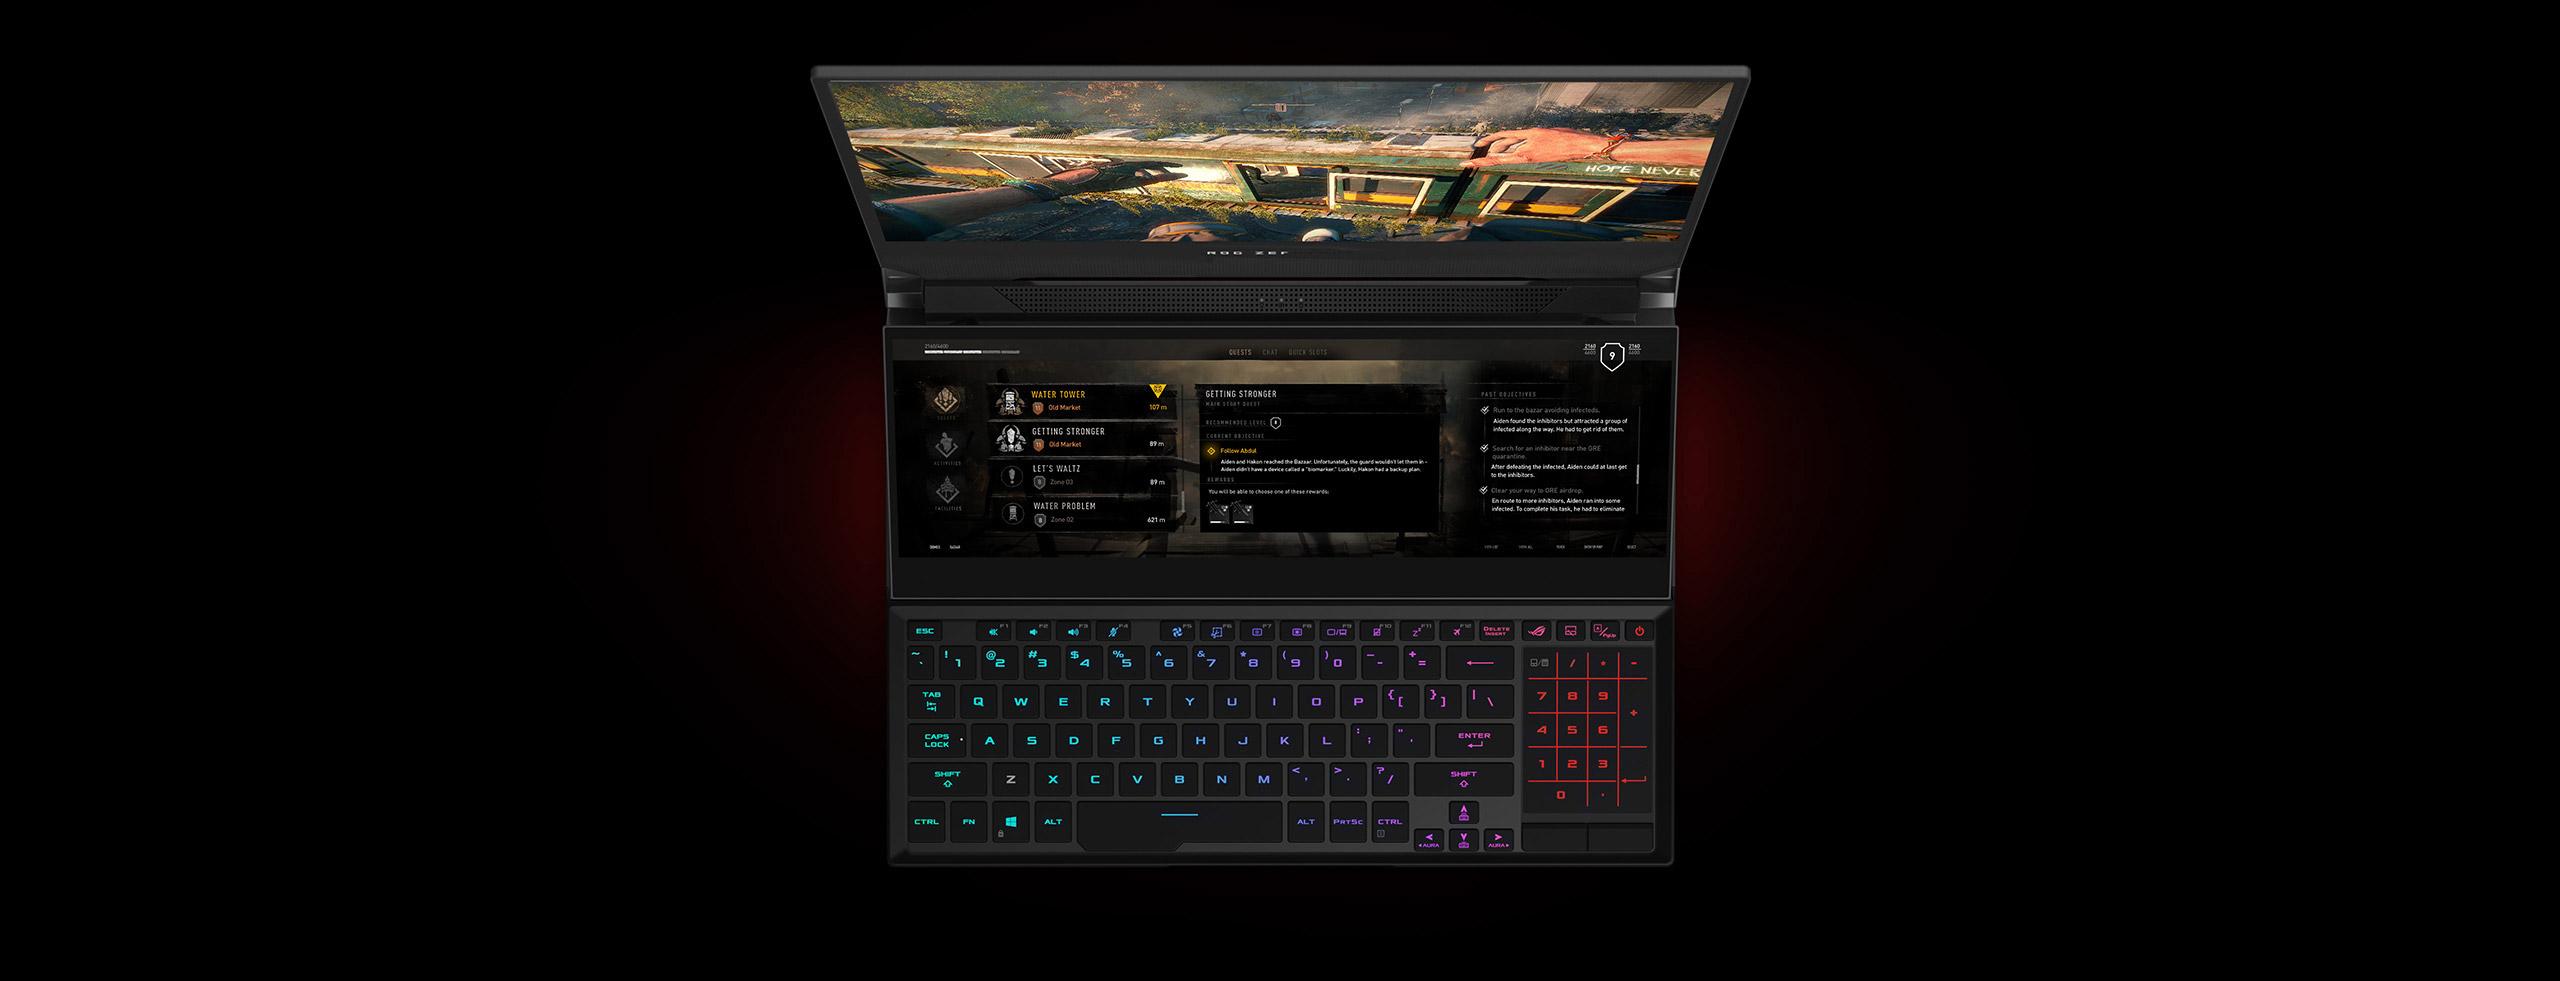 Herný notebook Asus ROG Zephyrus Duo 15